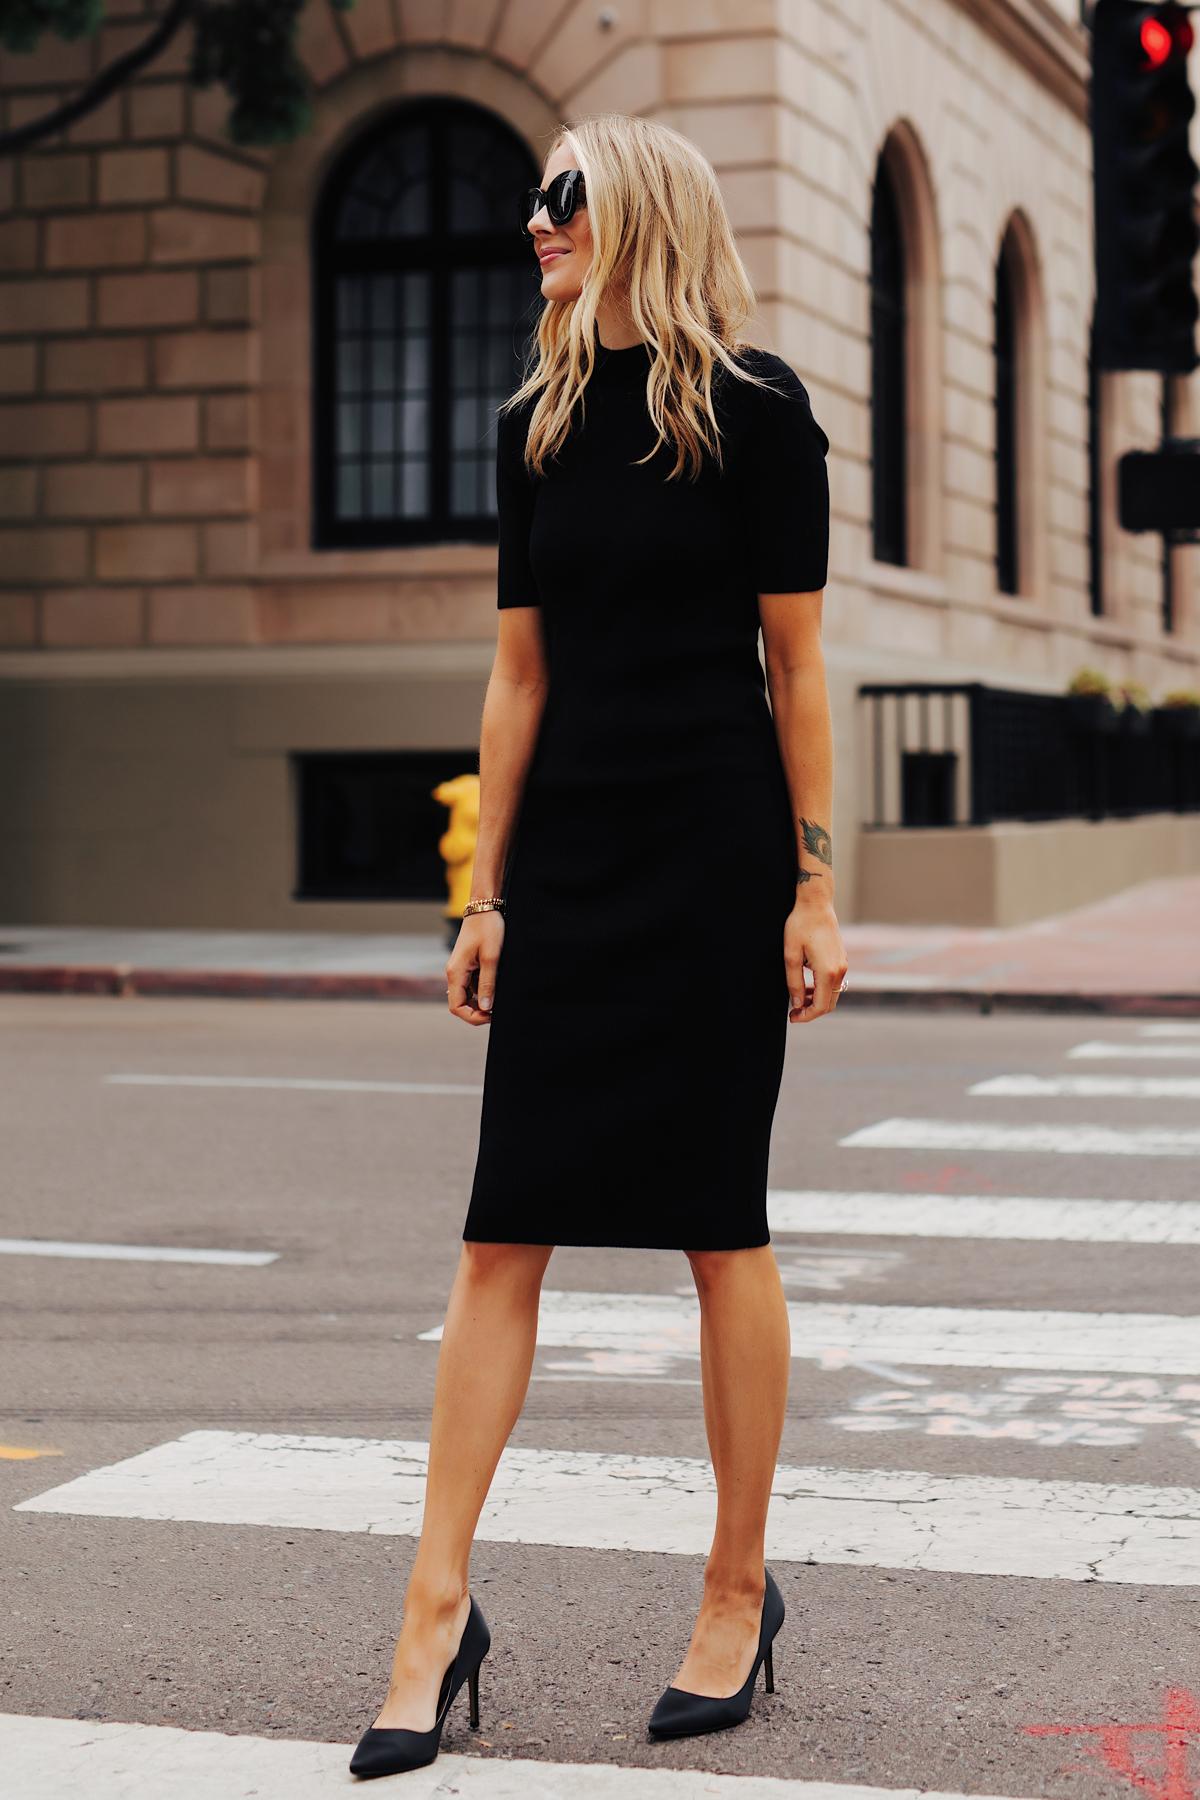 Fashion Jackson Wearing Black Midi Dress Black Pumps 1